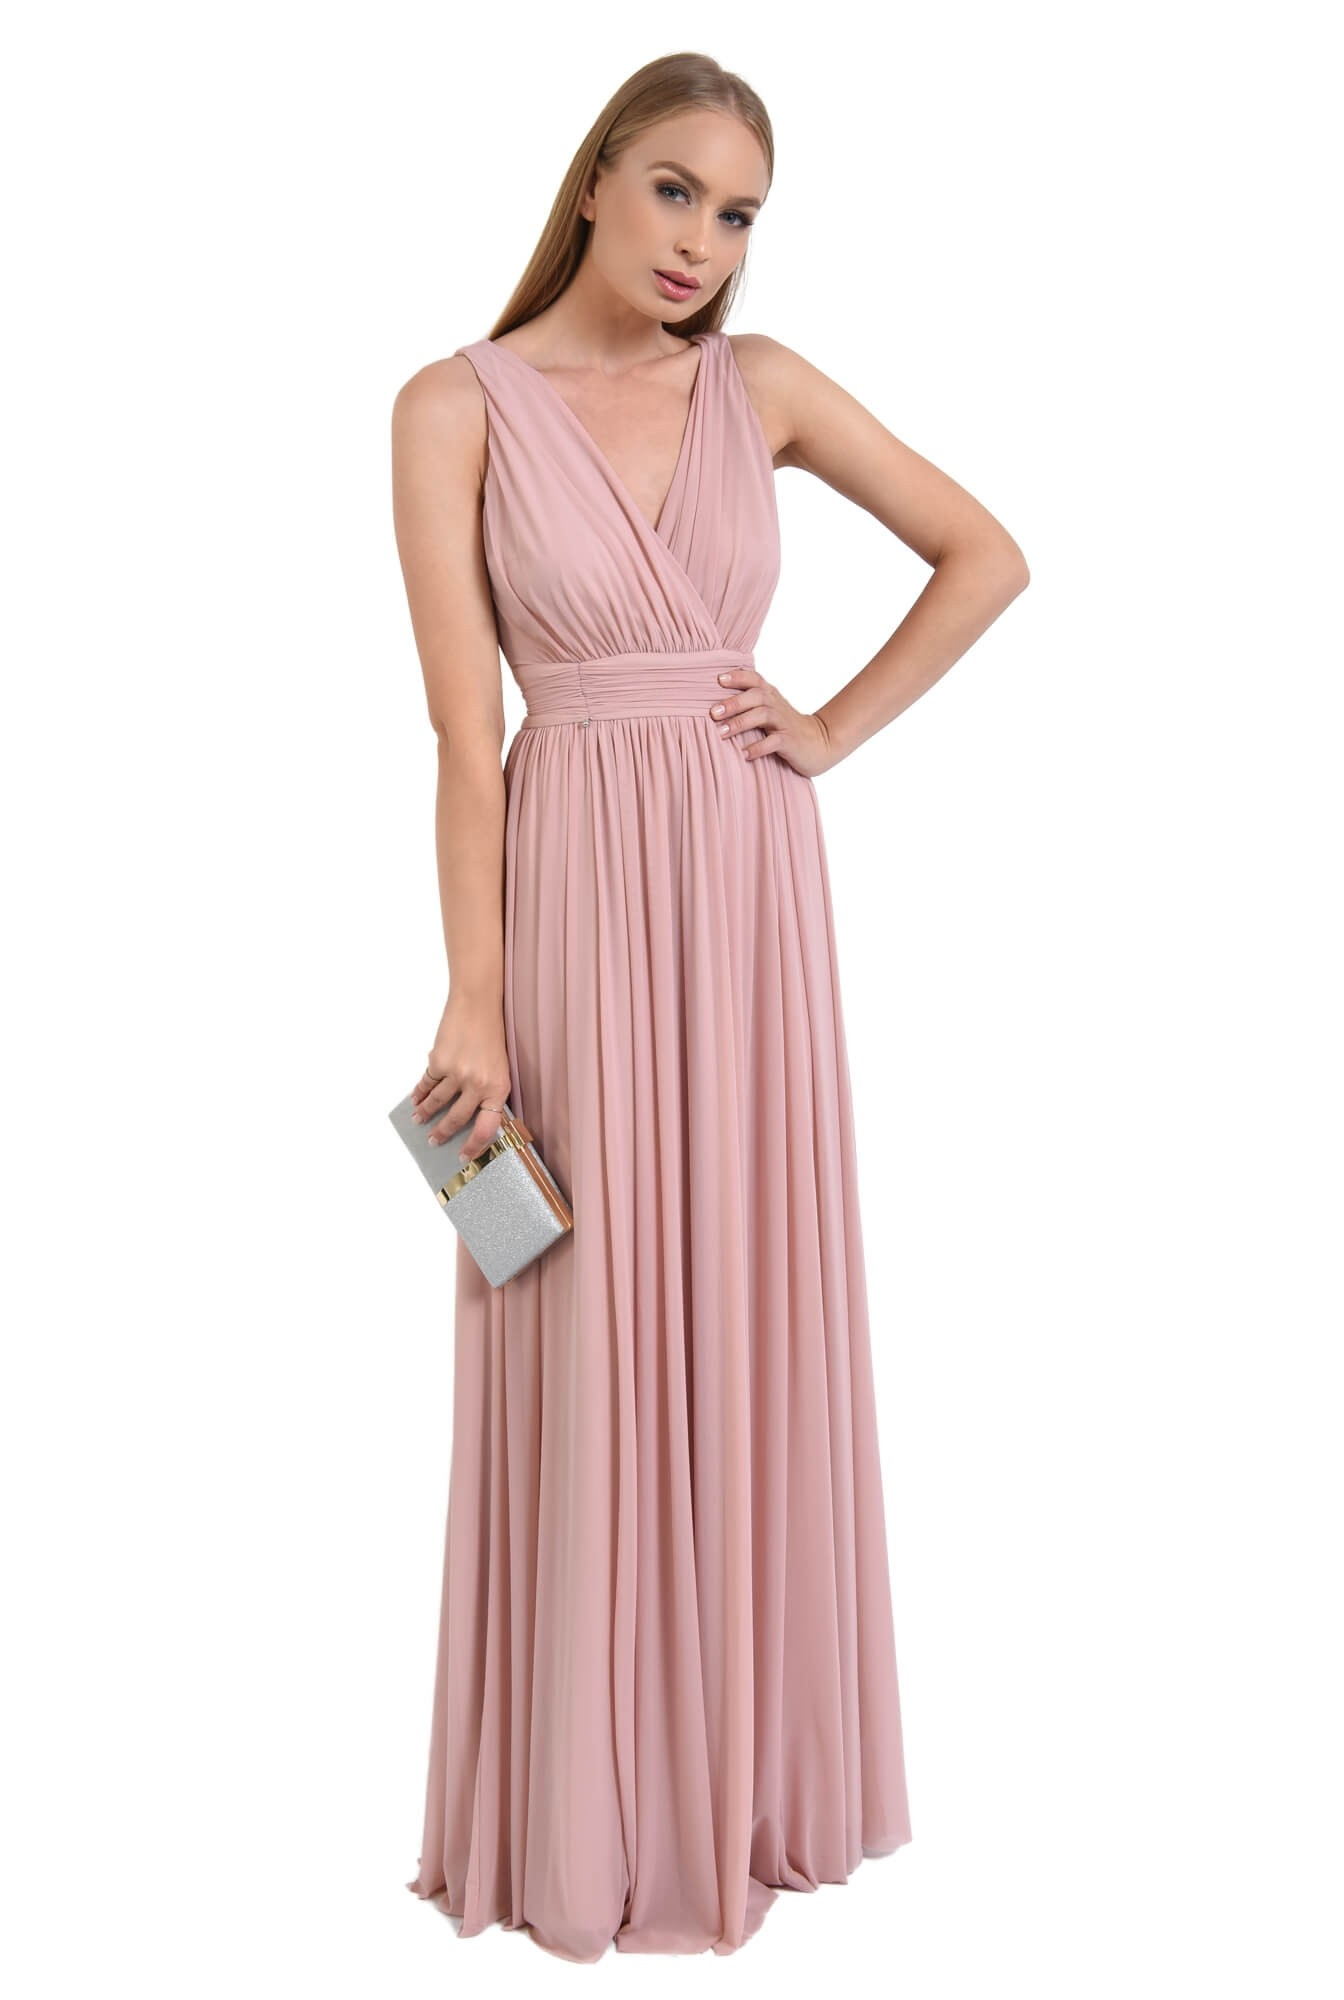 0 - rochie de seara, lunga, tul, roz, spate gol